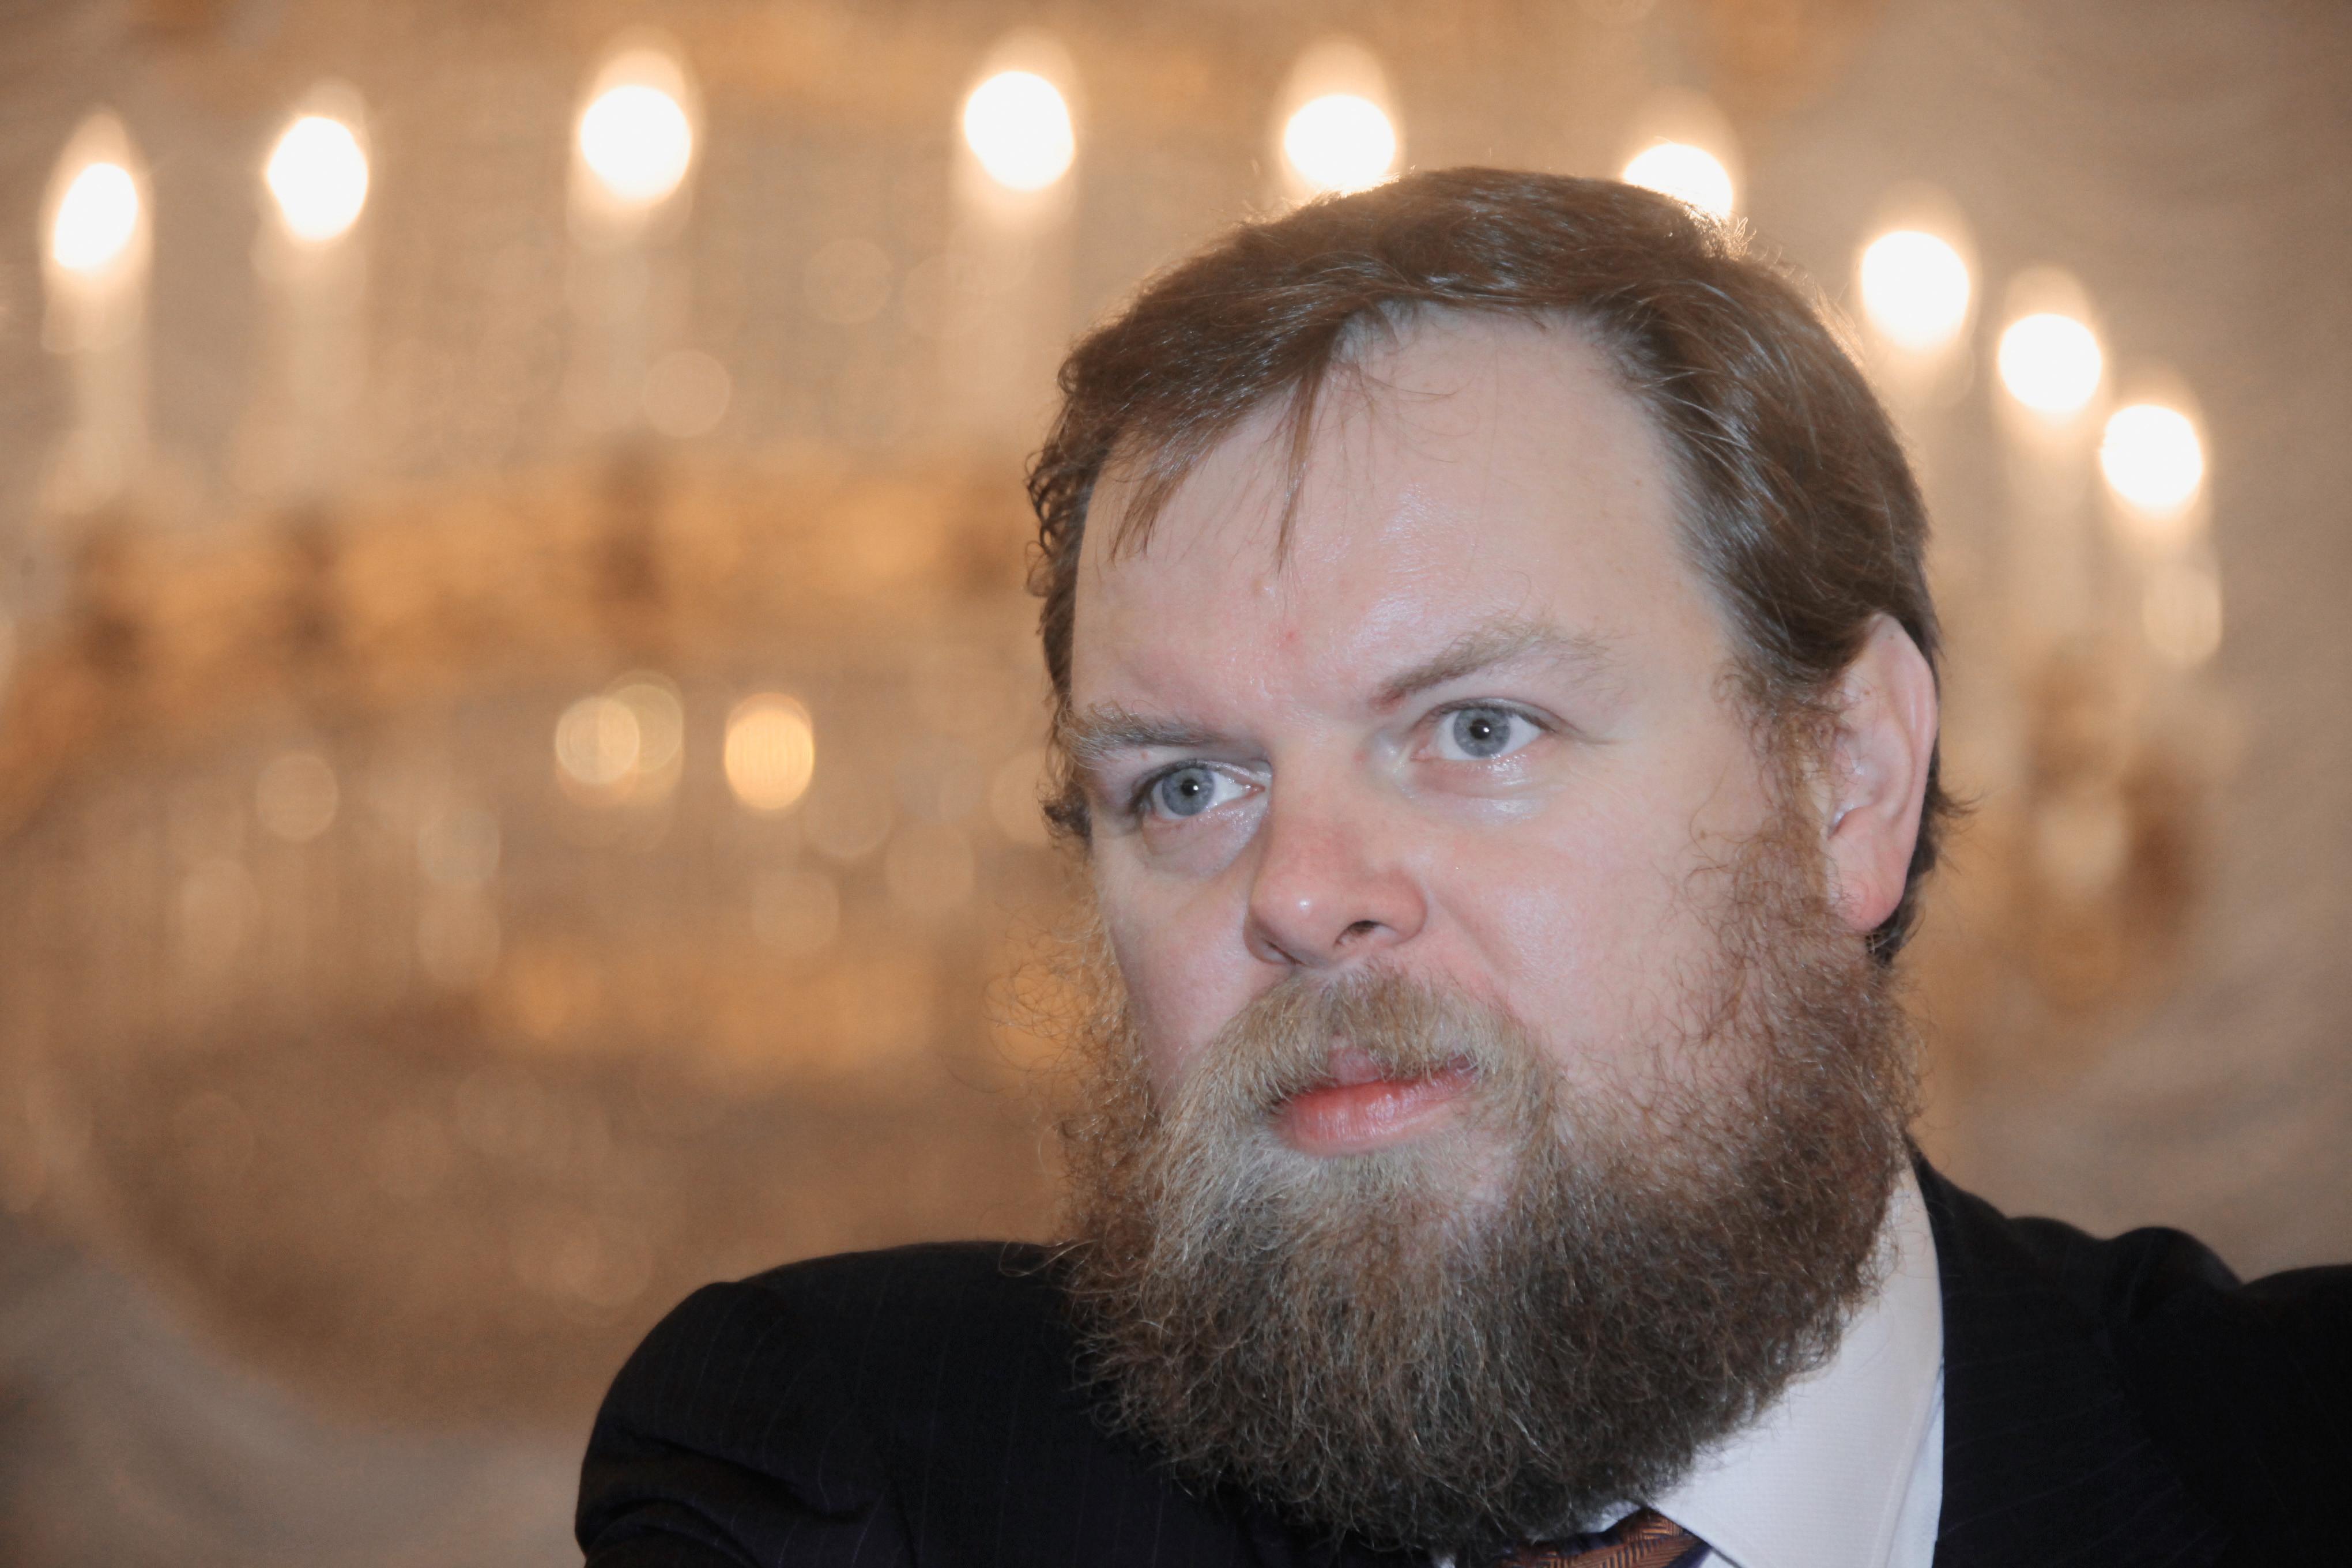 <p>Дмитрий Ананьев. Фото: РИА Новости/Руслан Кривобок</p>